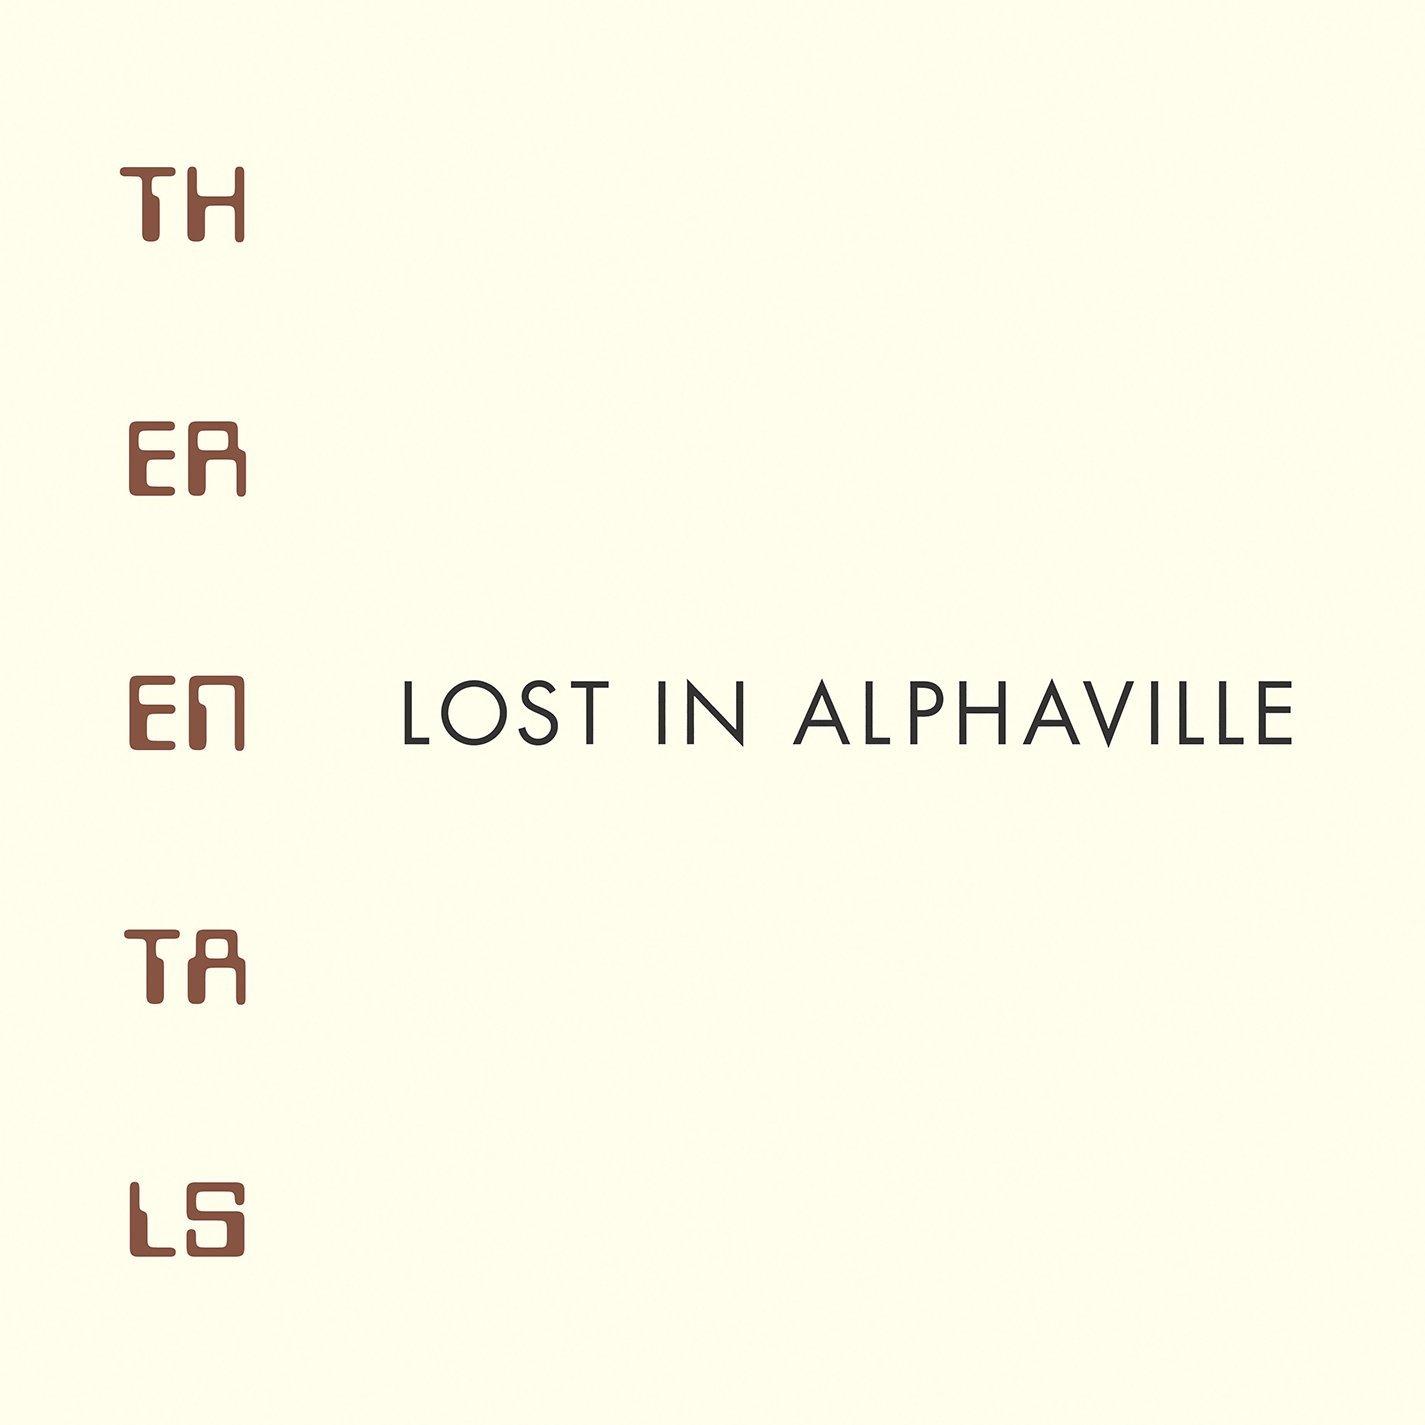 rentals-lost-in-alphaville